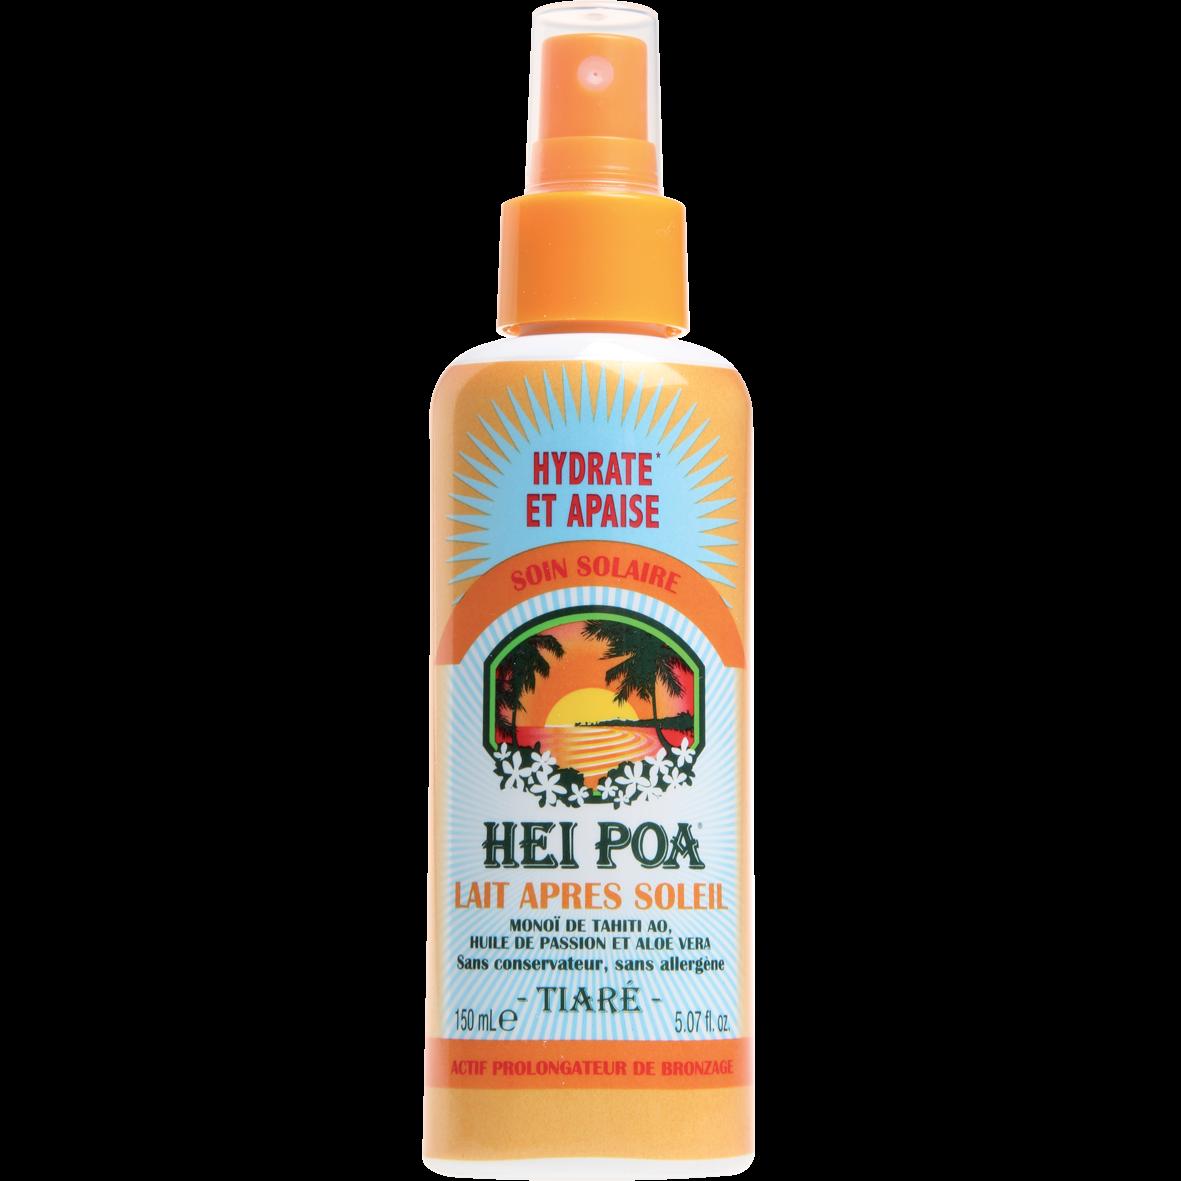 Hei Poa After Sun Milk Tiare Spray – Γαλάκτωμα για μετά τον Hλιο 150ml